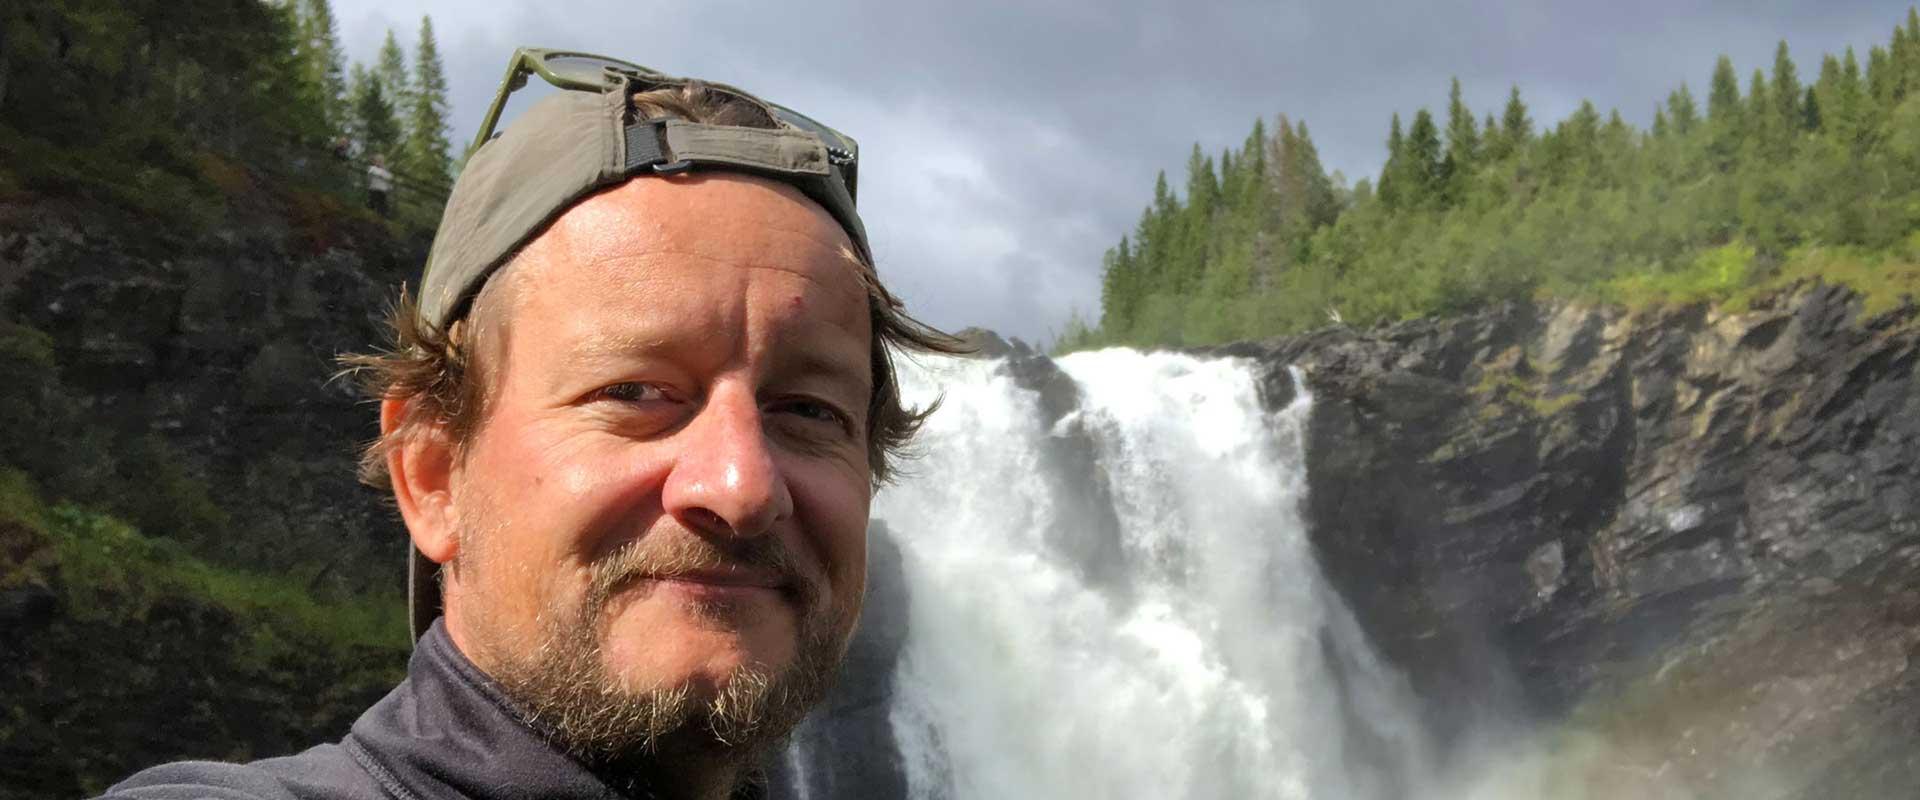 A man in front of Tännforsen